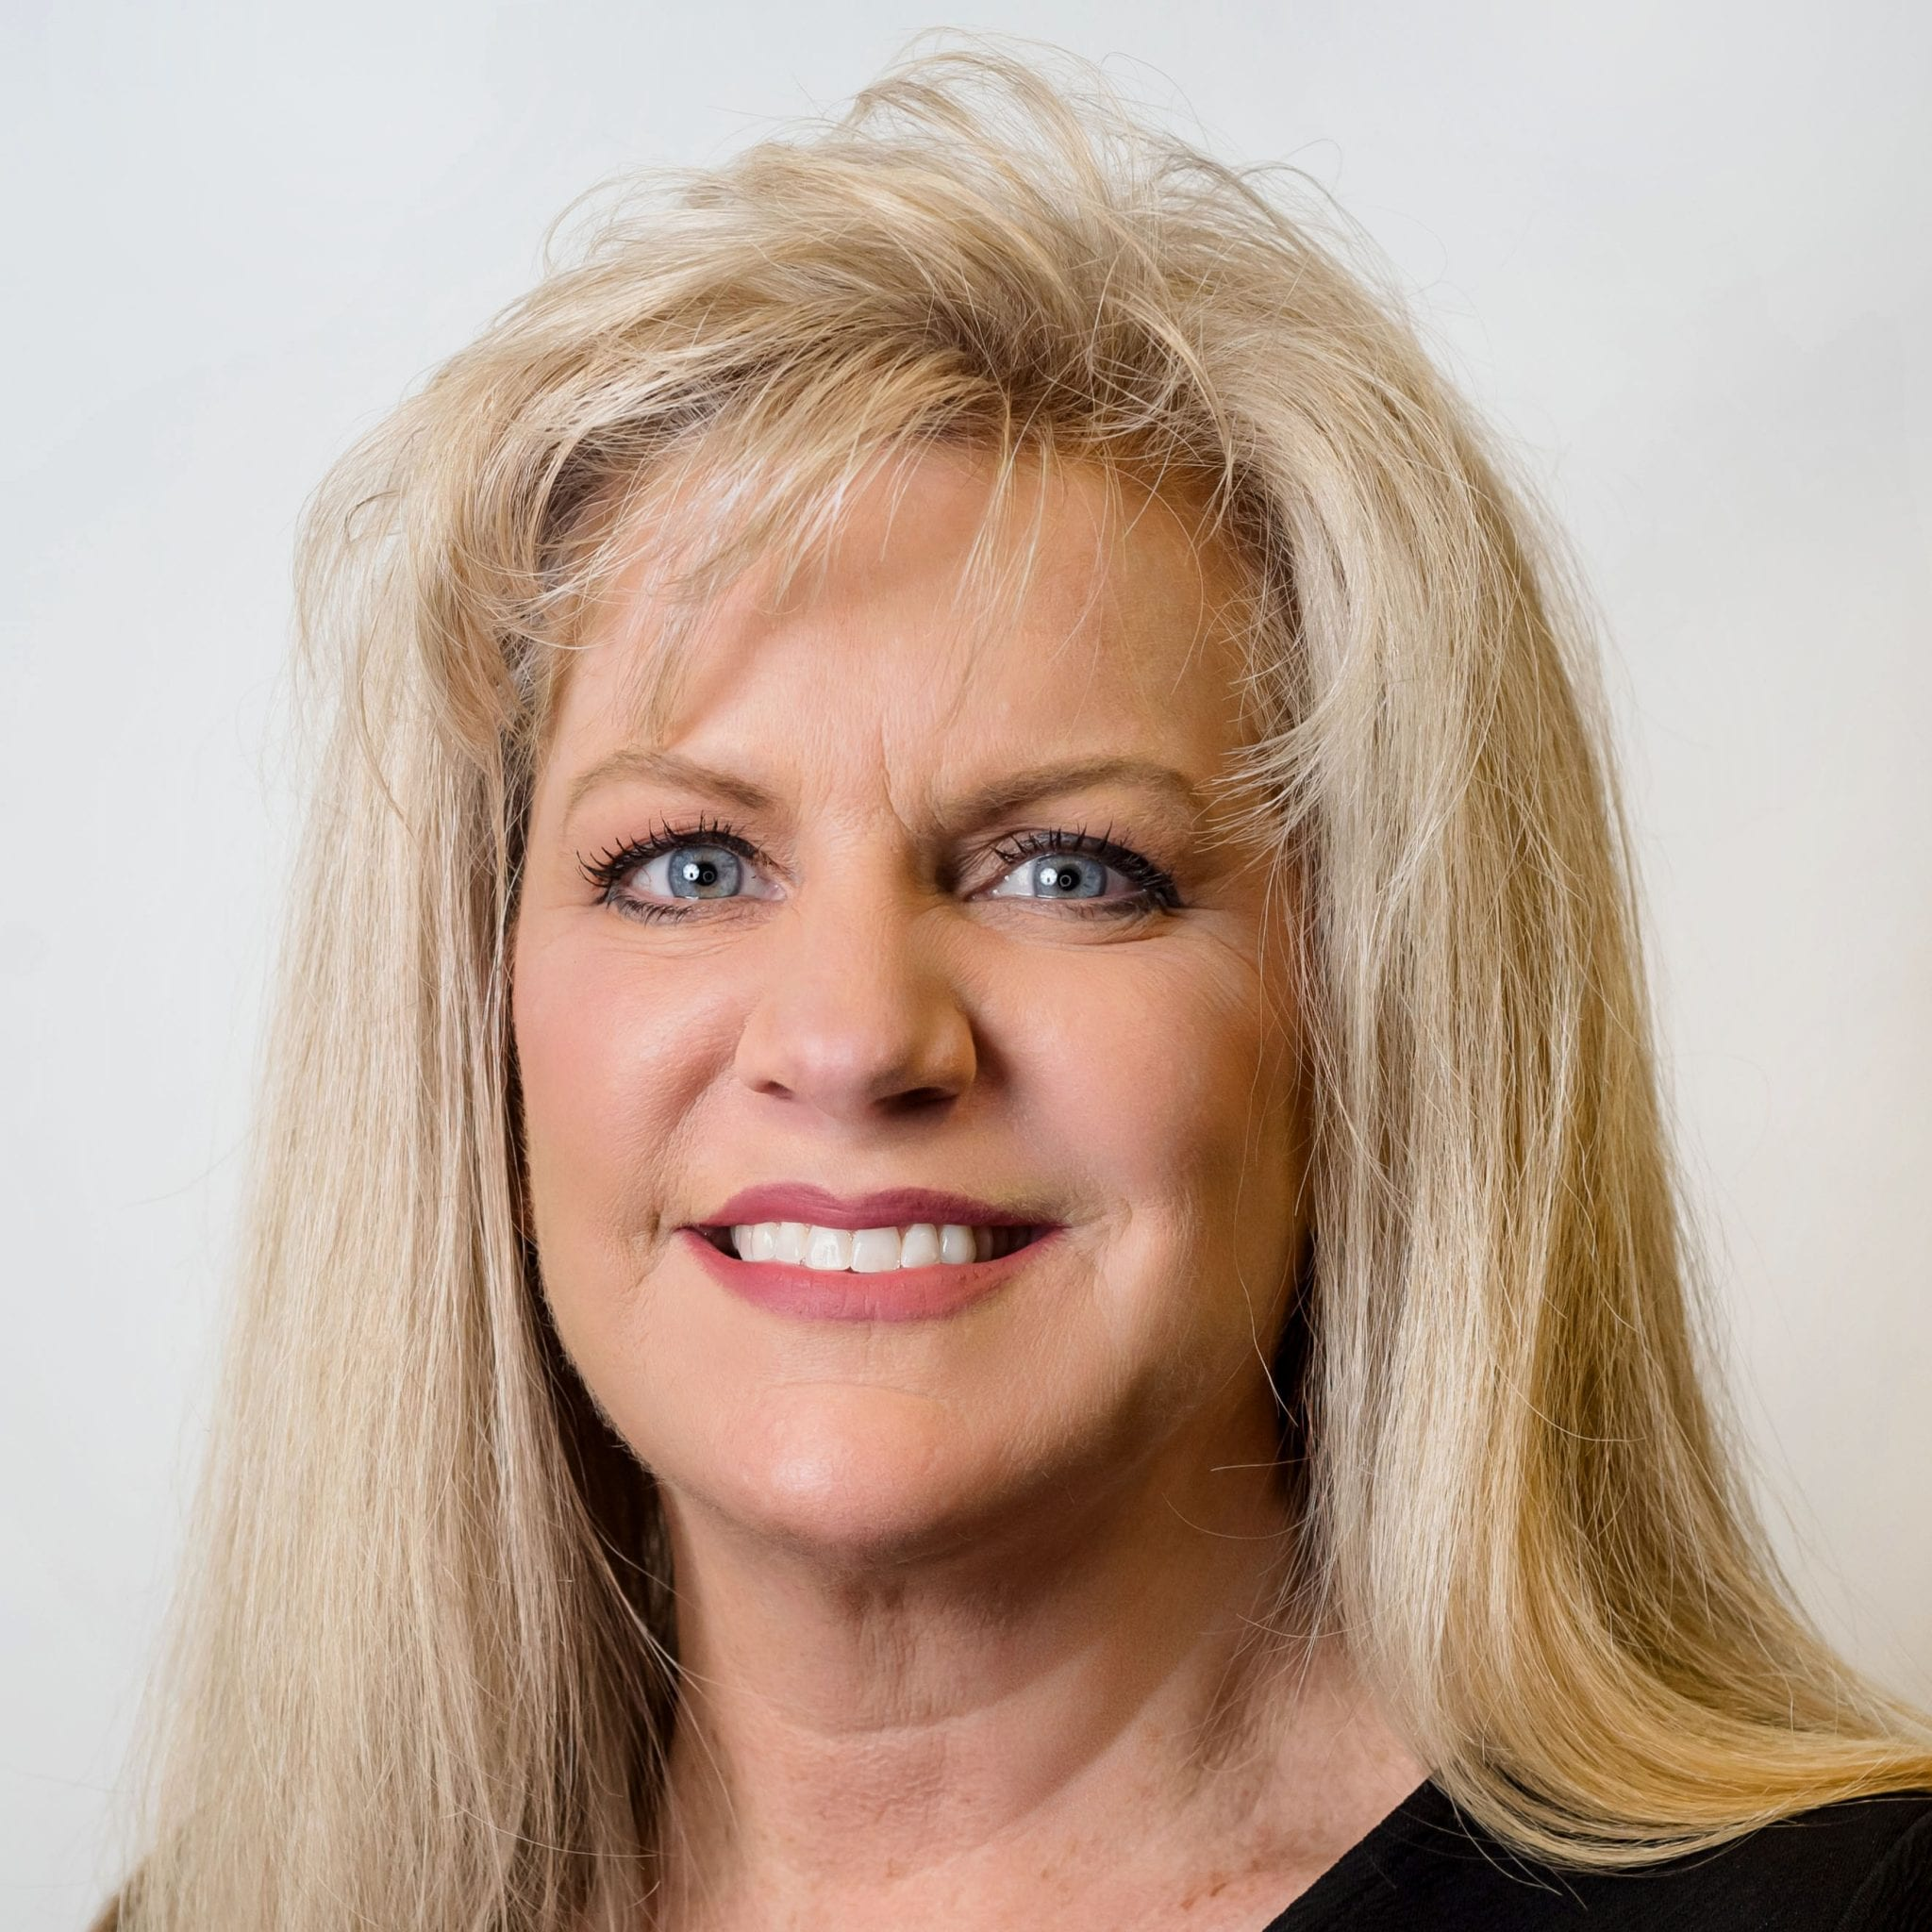 Melissa Duffy